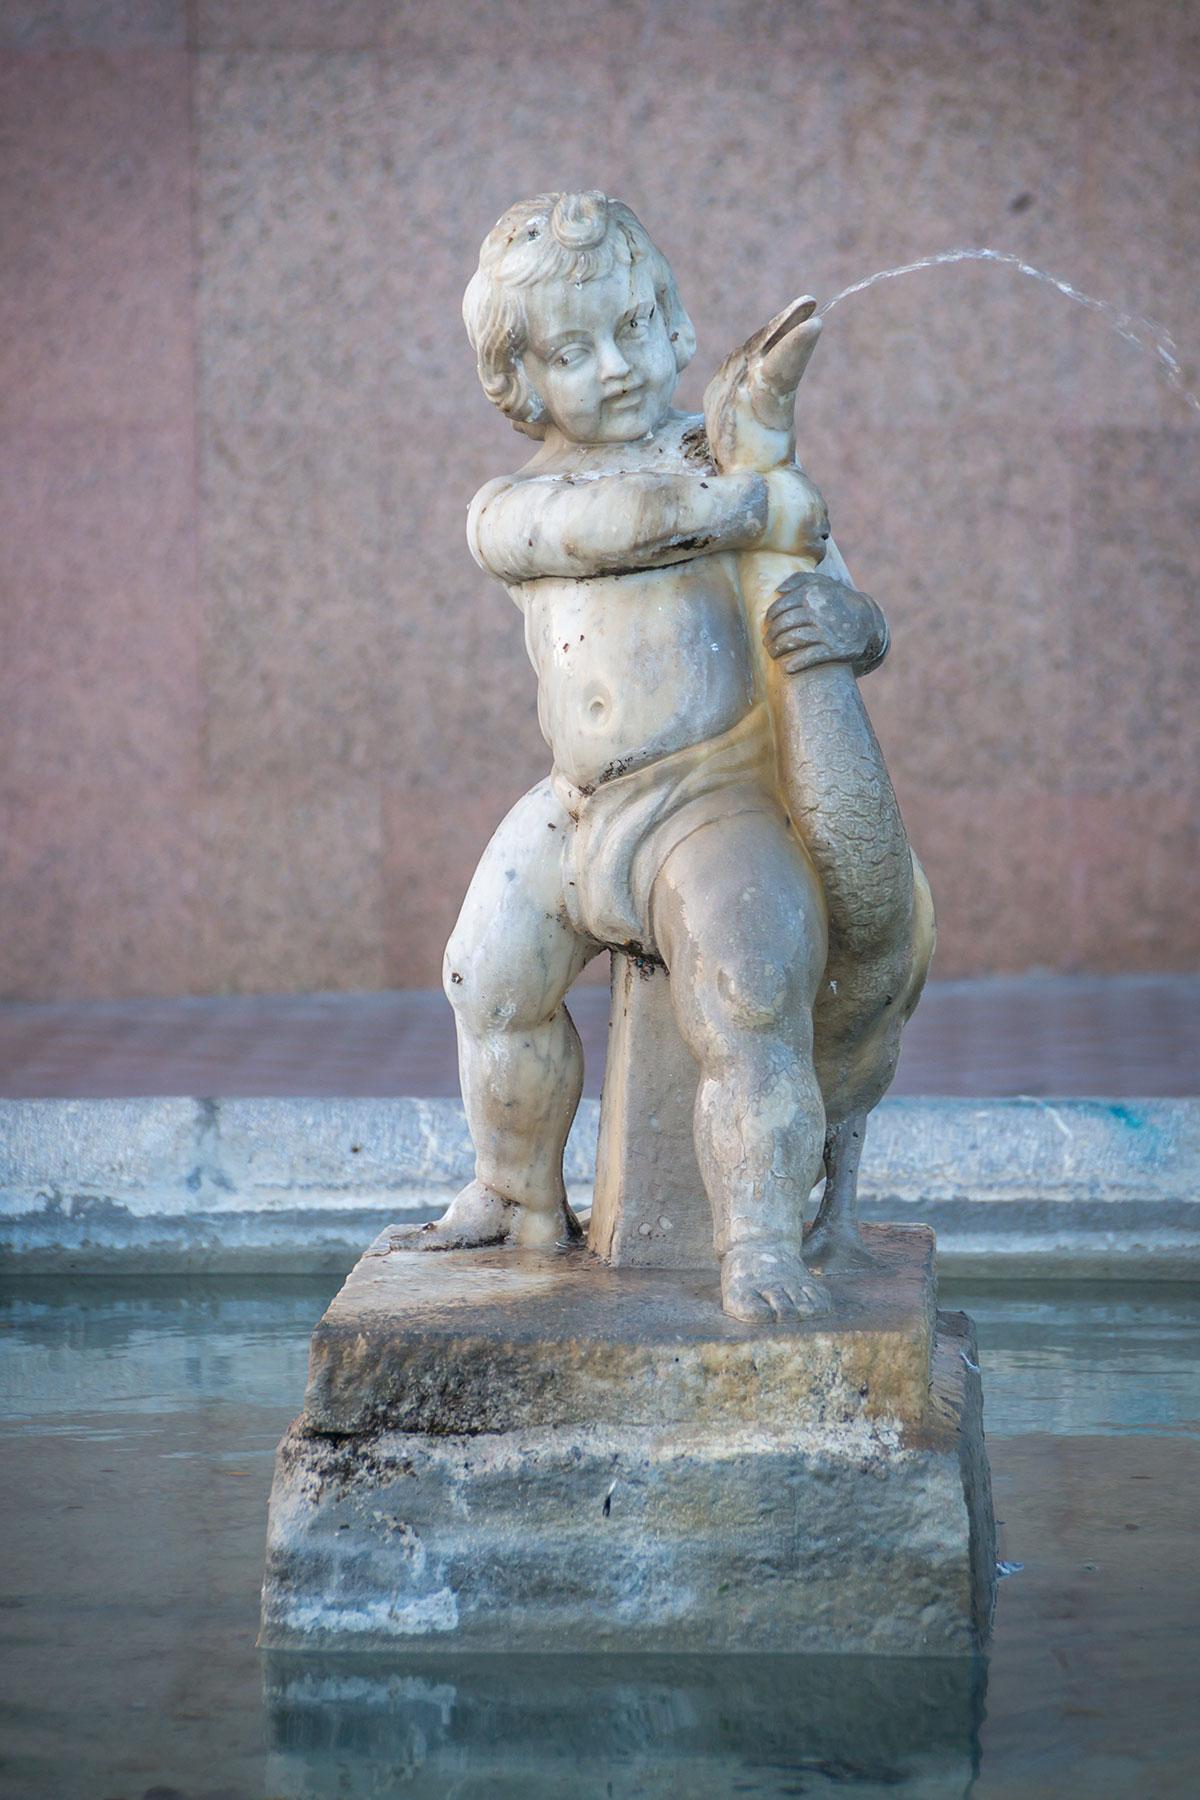 Spanien, Katalonien, Tarragona, Statue am Passier de les Palmeres